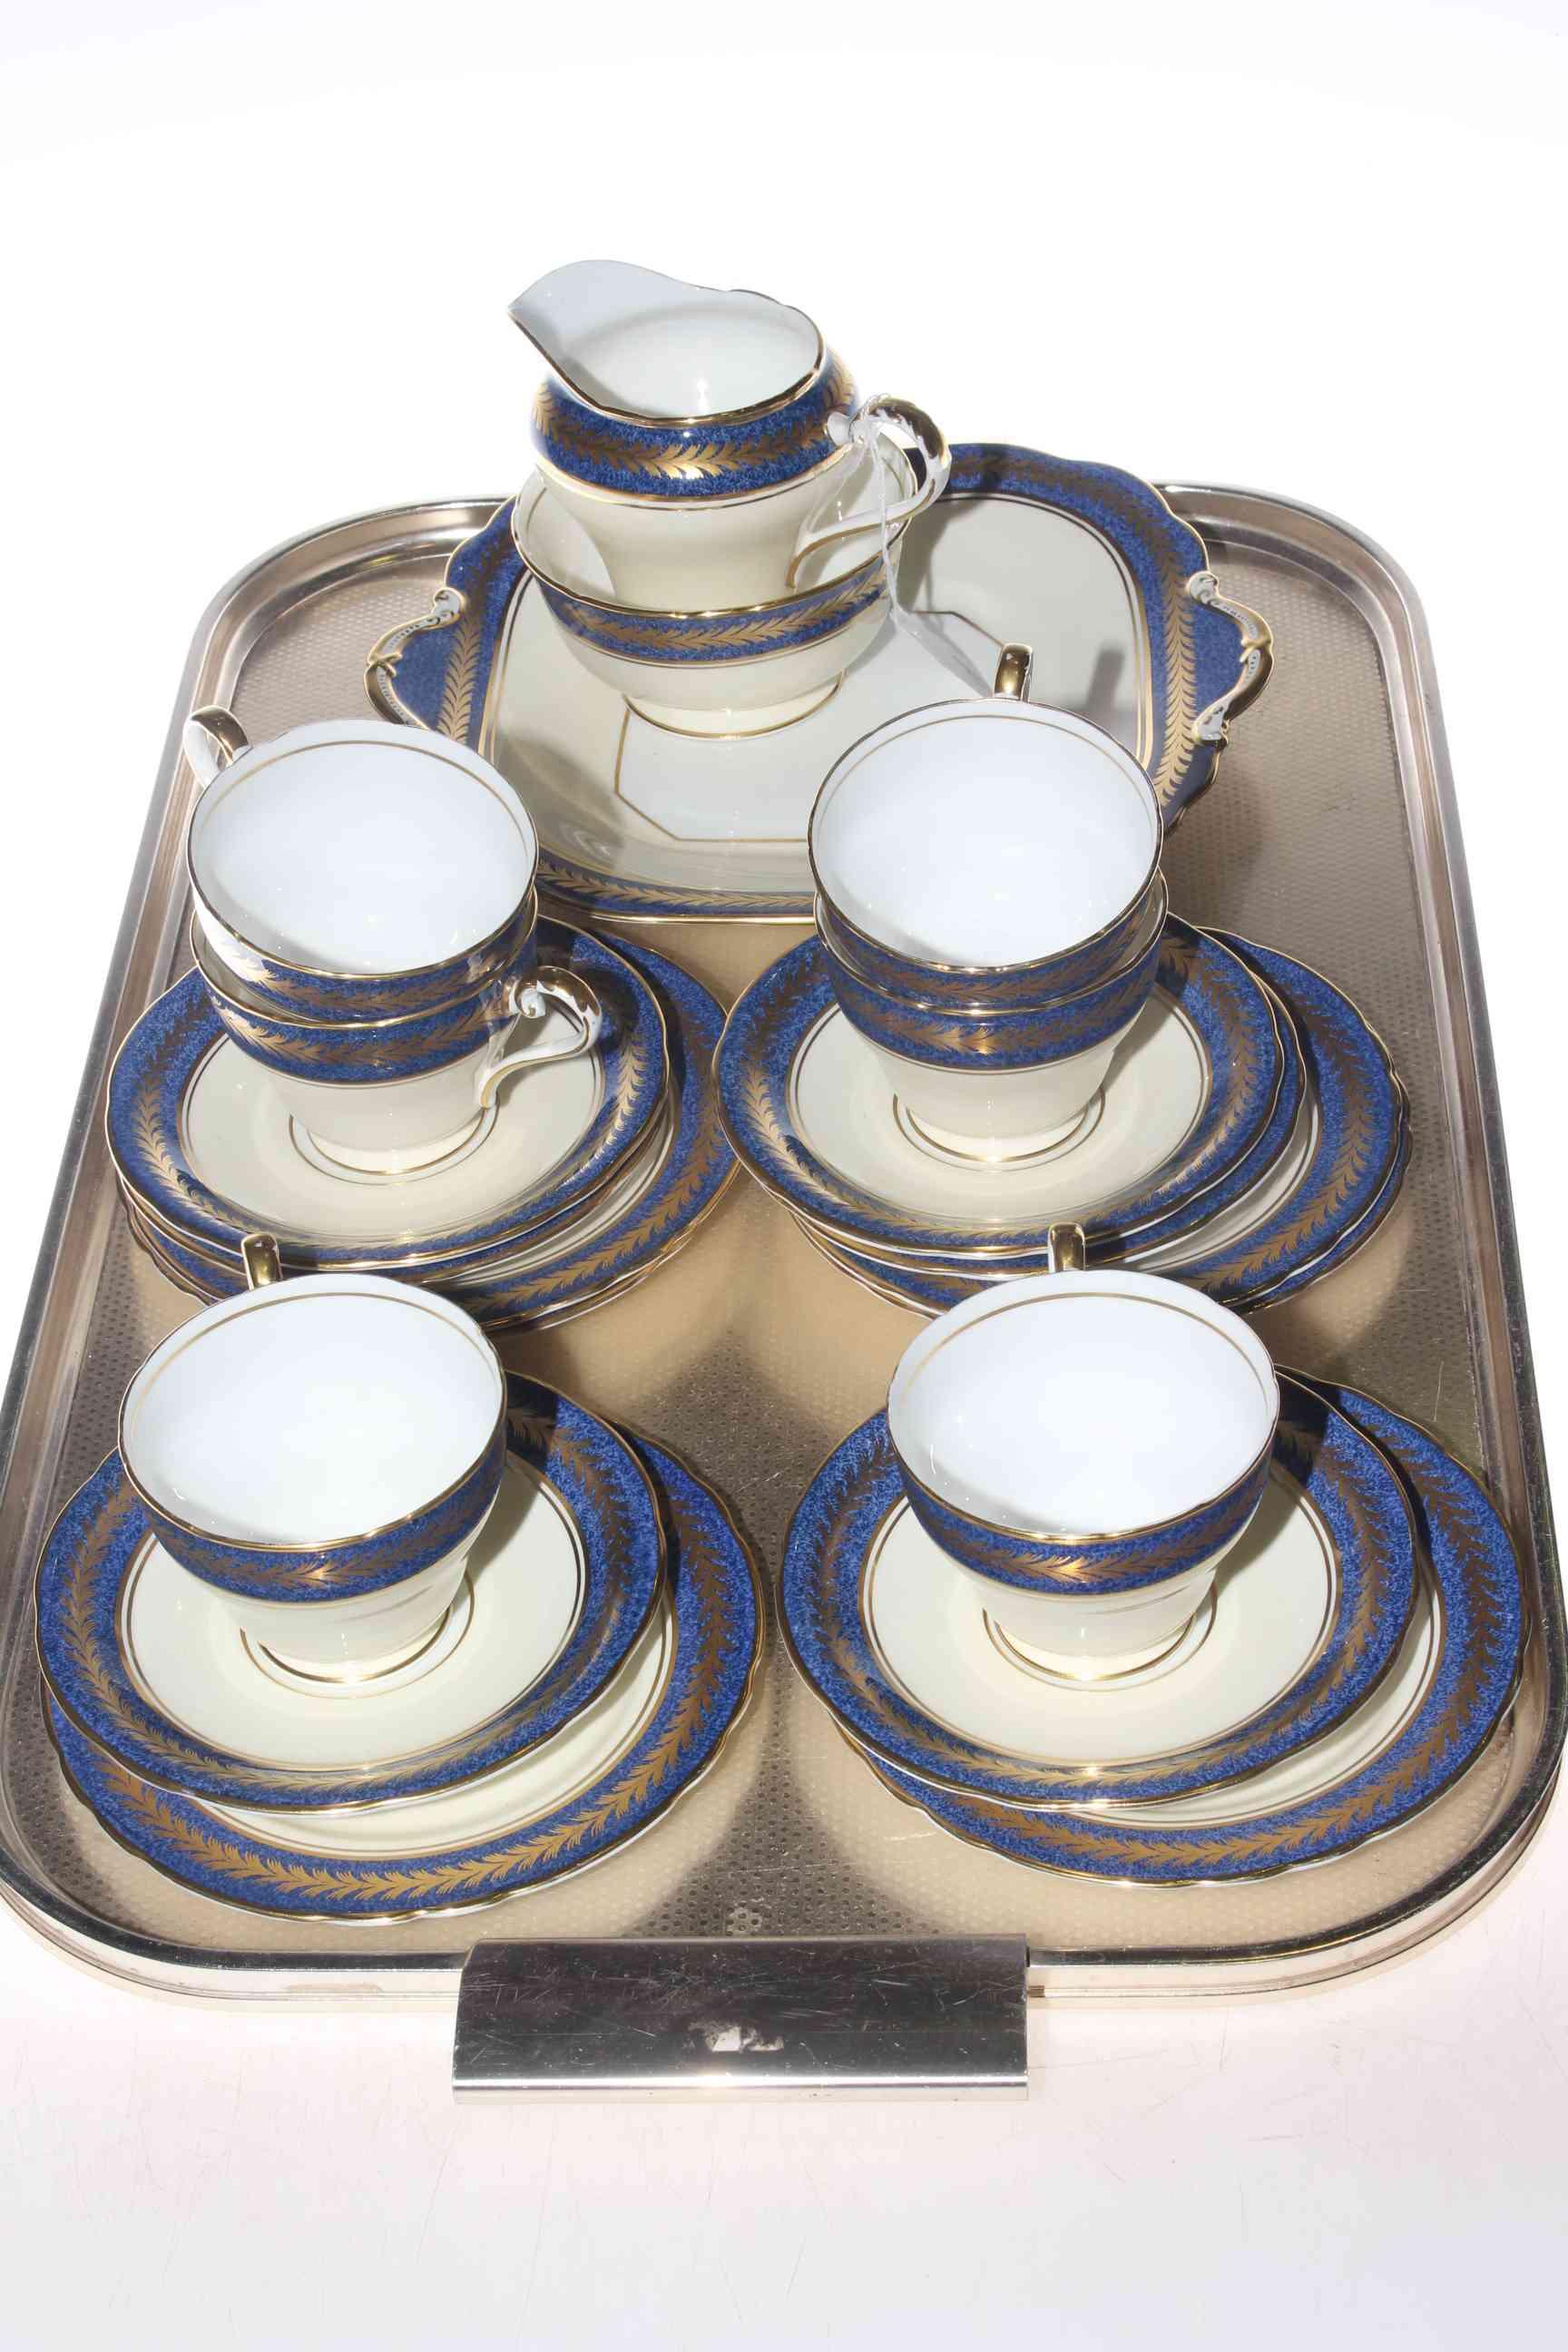 Lot 9 - Aynsley twenty one piece Blue Marble and Laurel Wreath tea service painted no.